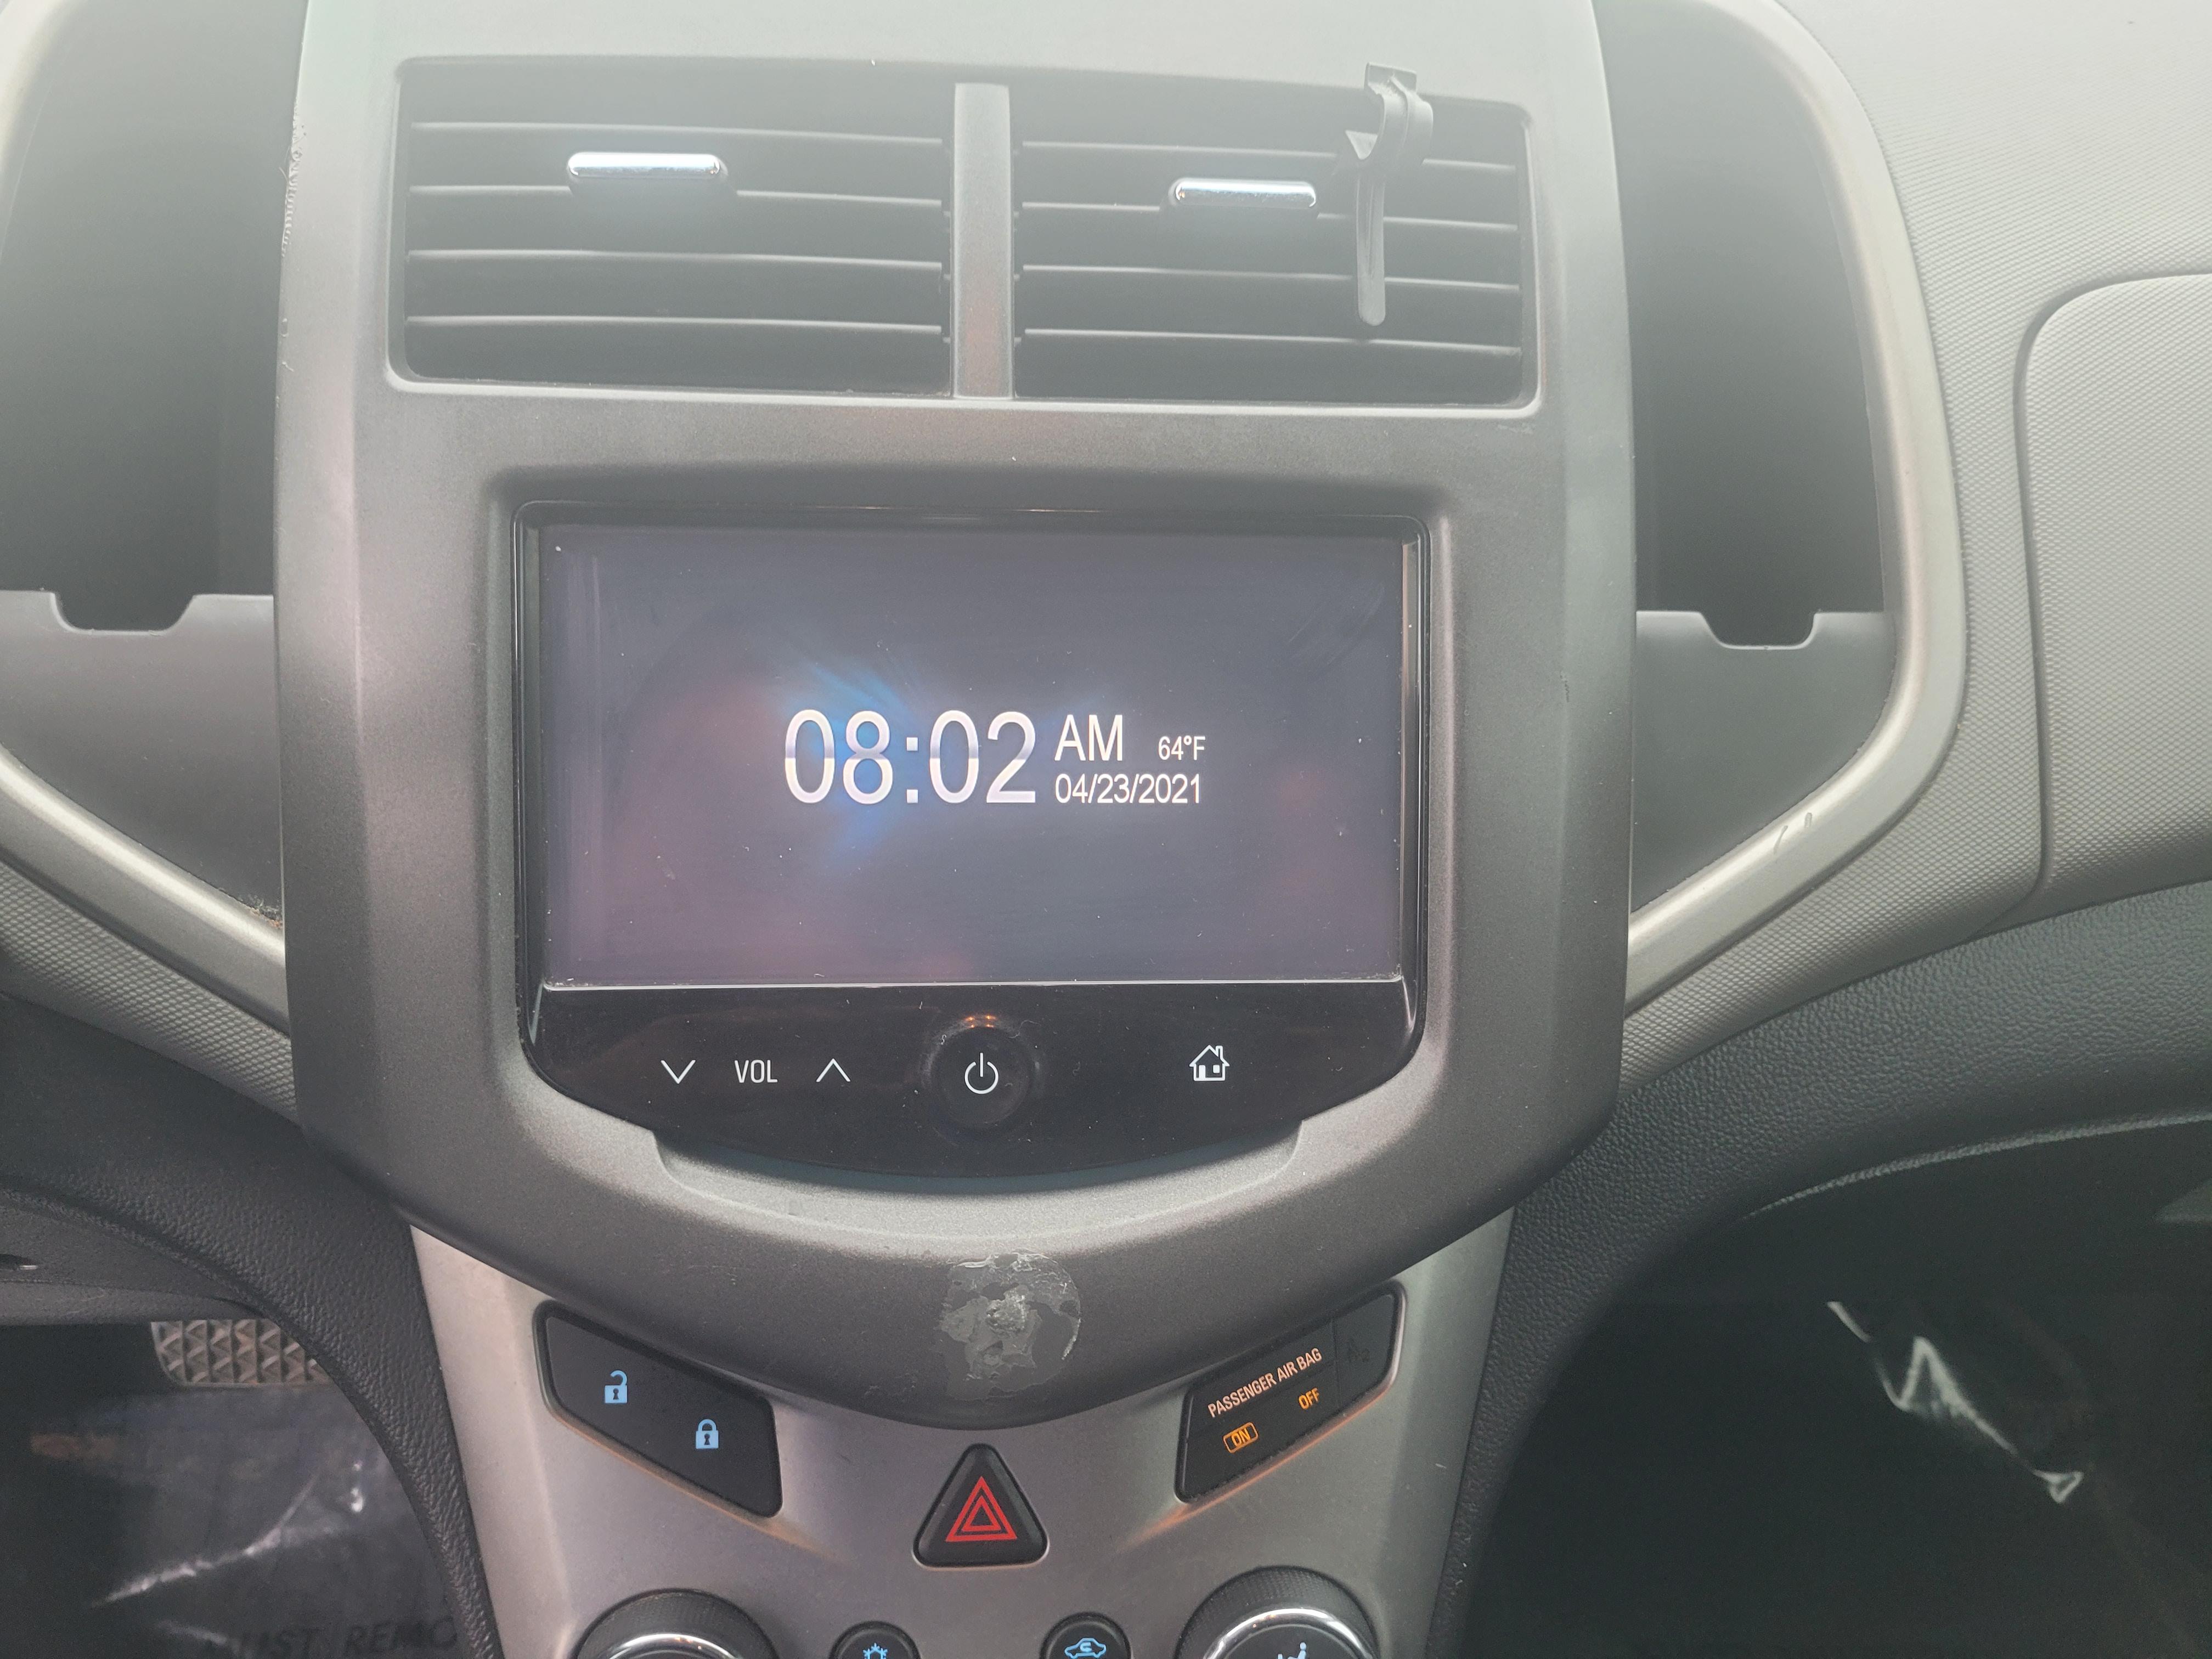 used vehicle - Sedan CHEVROLET SONIC 2014